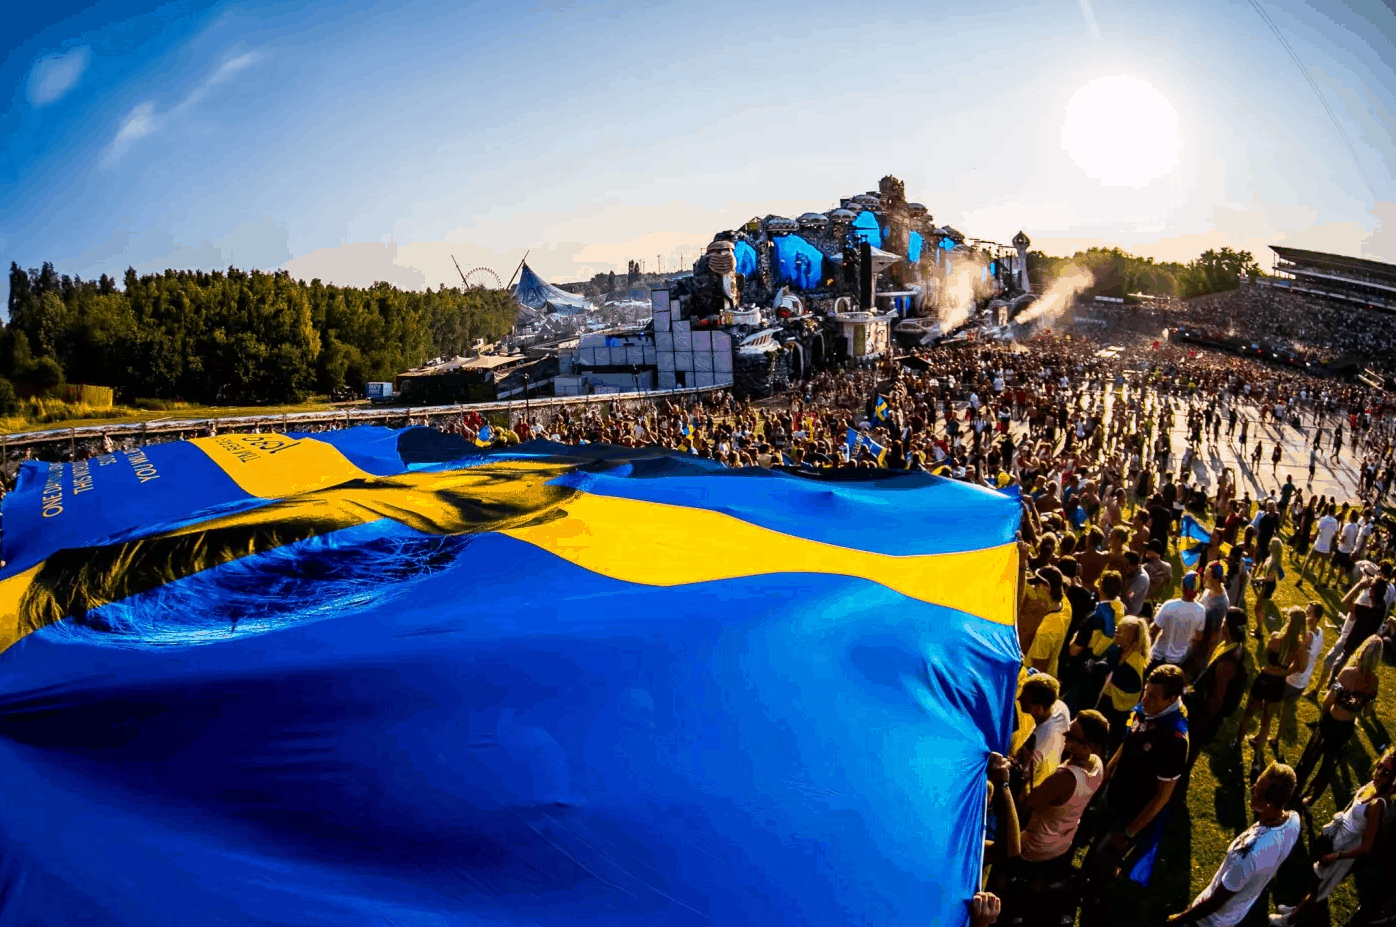 Swedish Avicii flag at Tomorrowland 2018